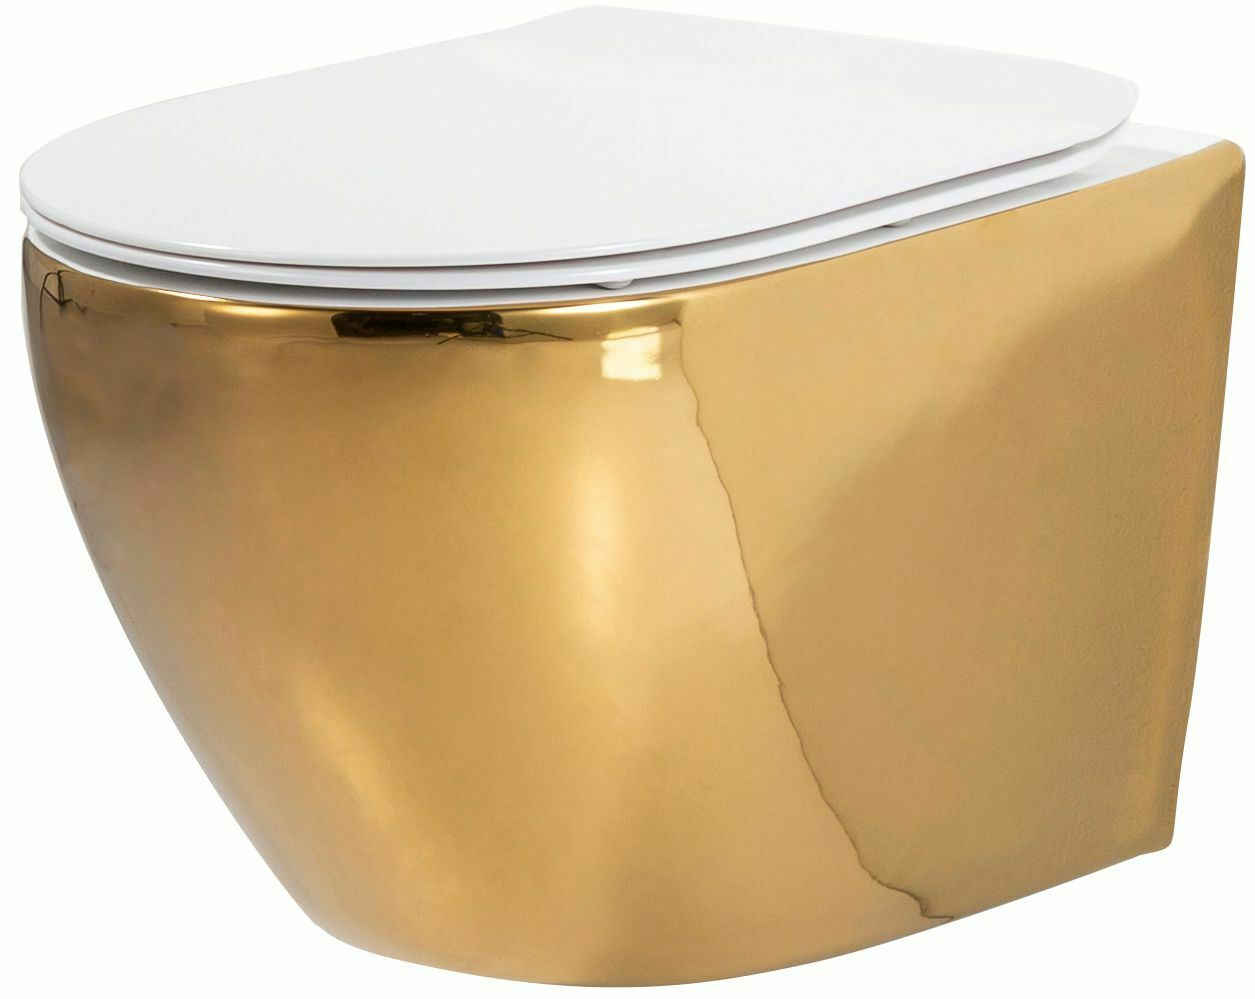 WandHänge WC Bidet Bad Keramik Sitz Randlos SoftClose CARLO MINI BASIC REA